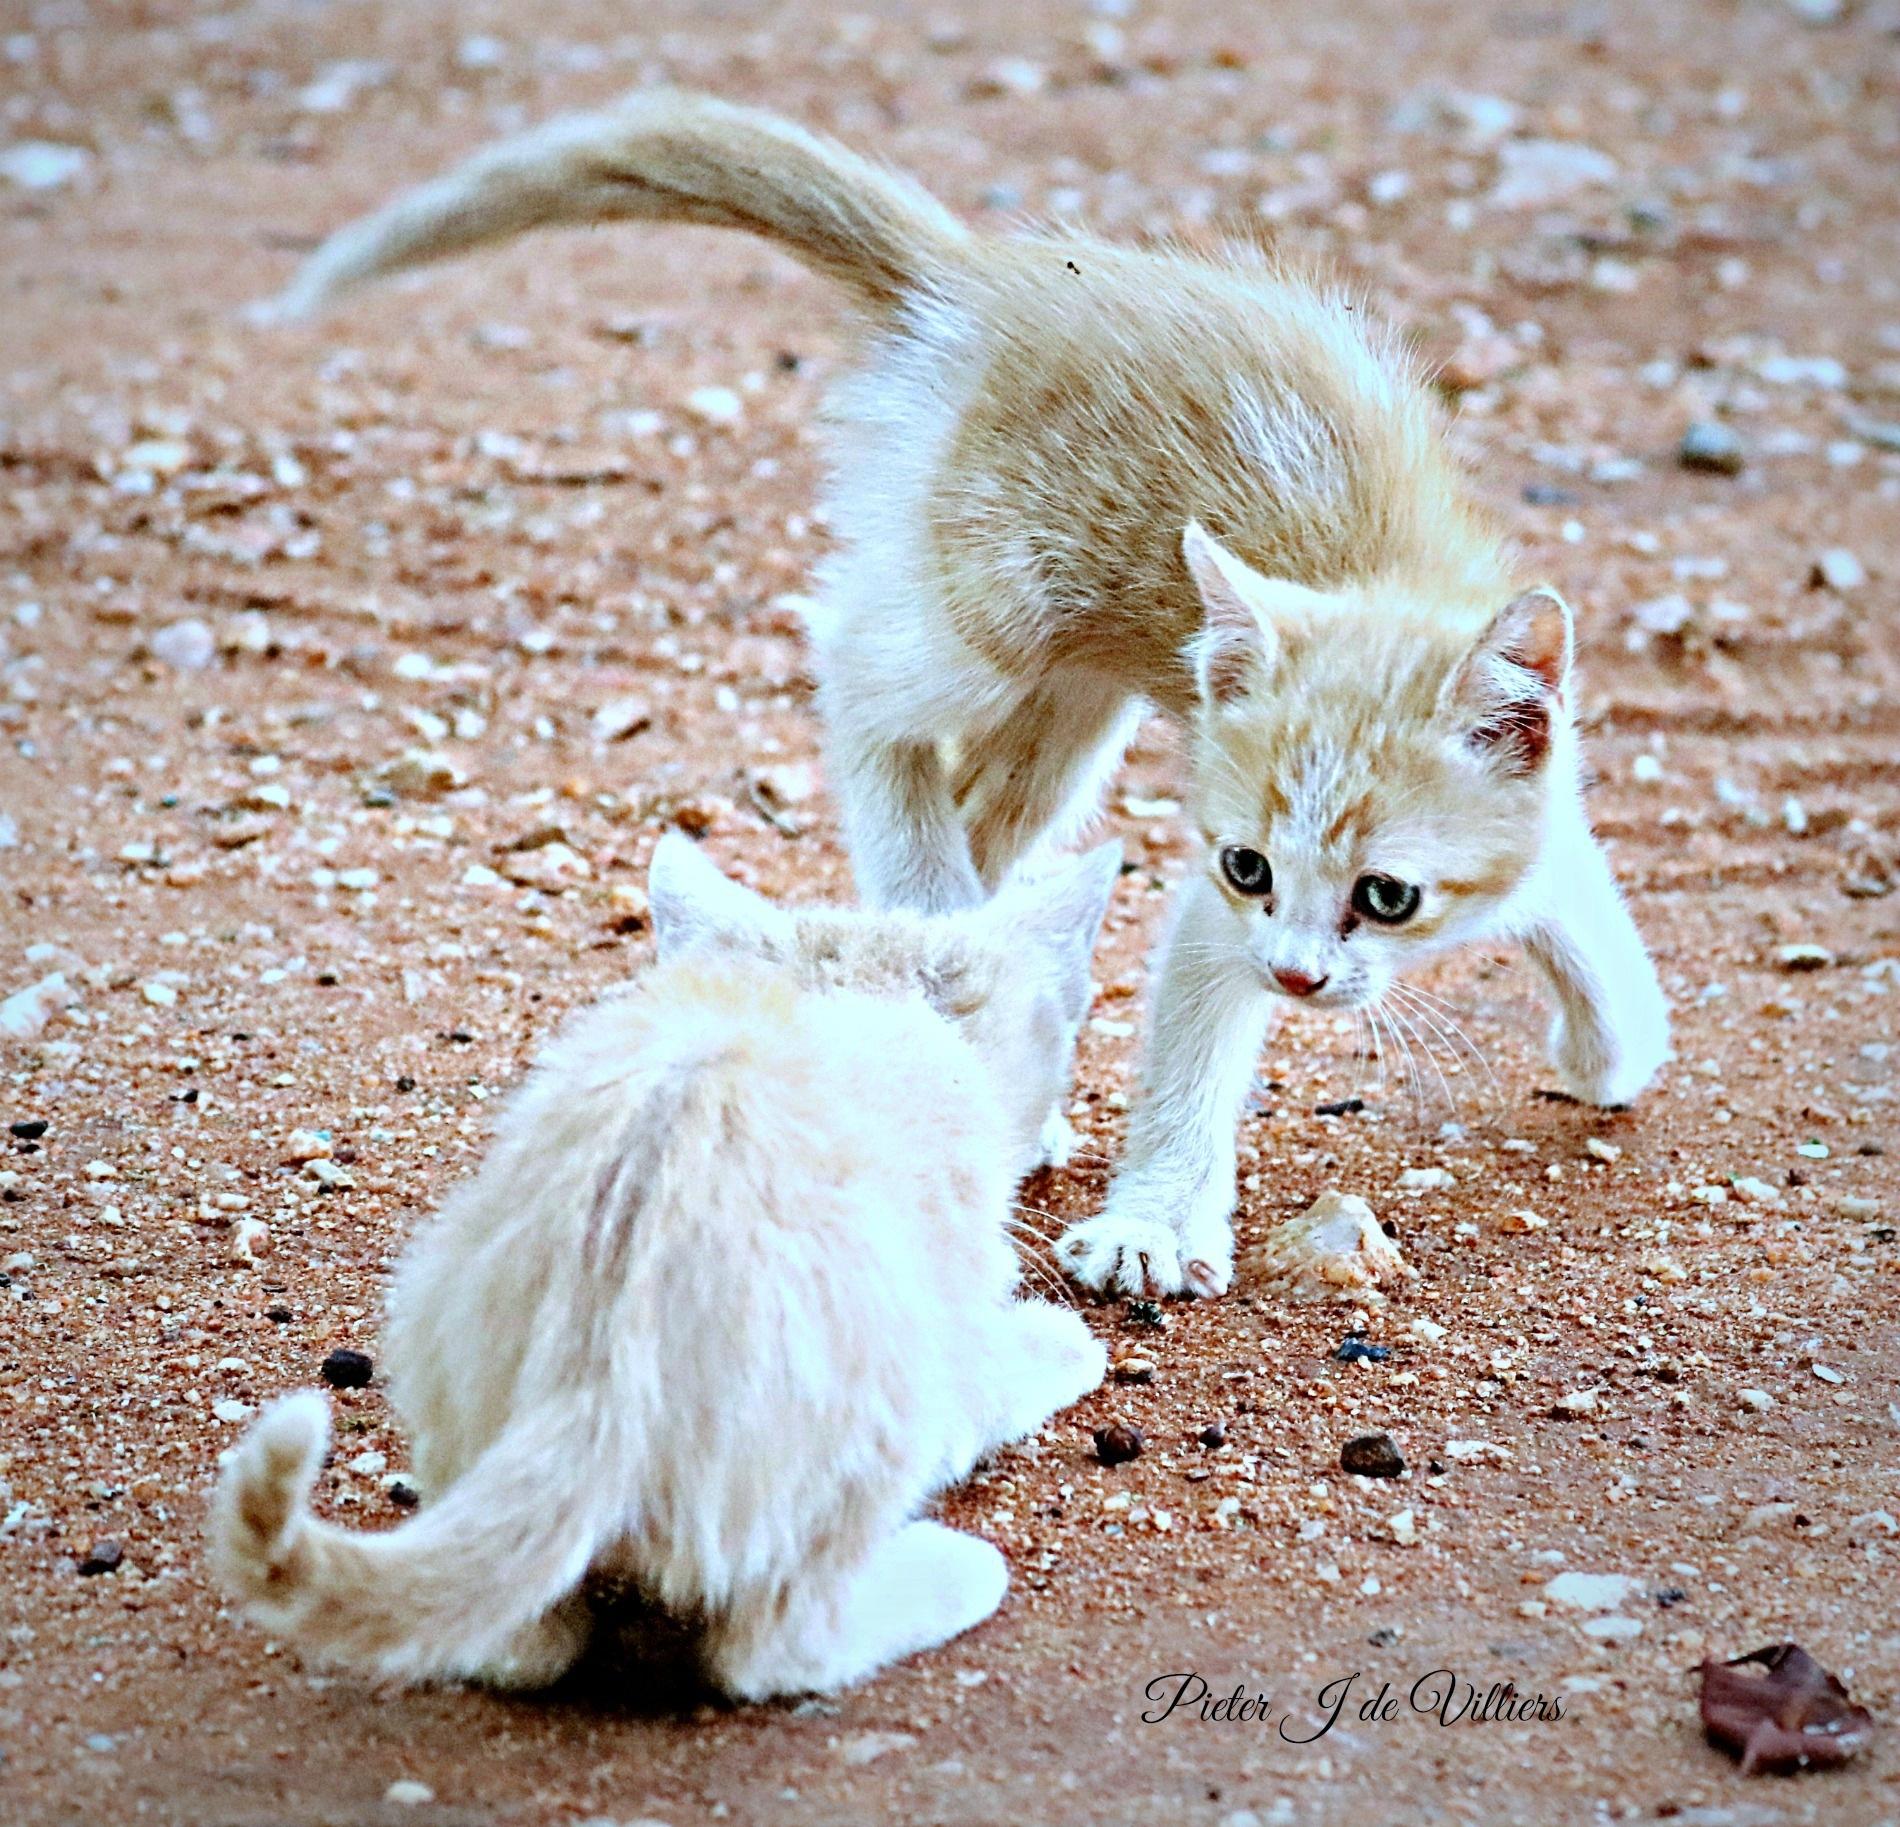 Kittens playing by Pieter J de Villiers